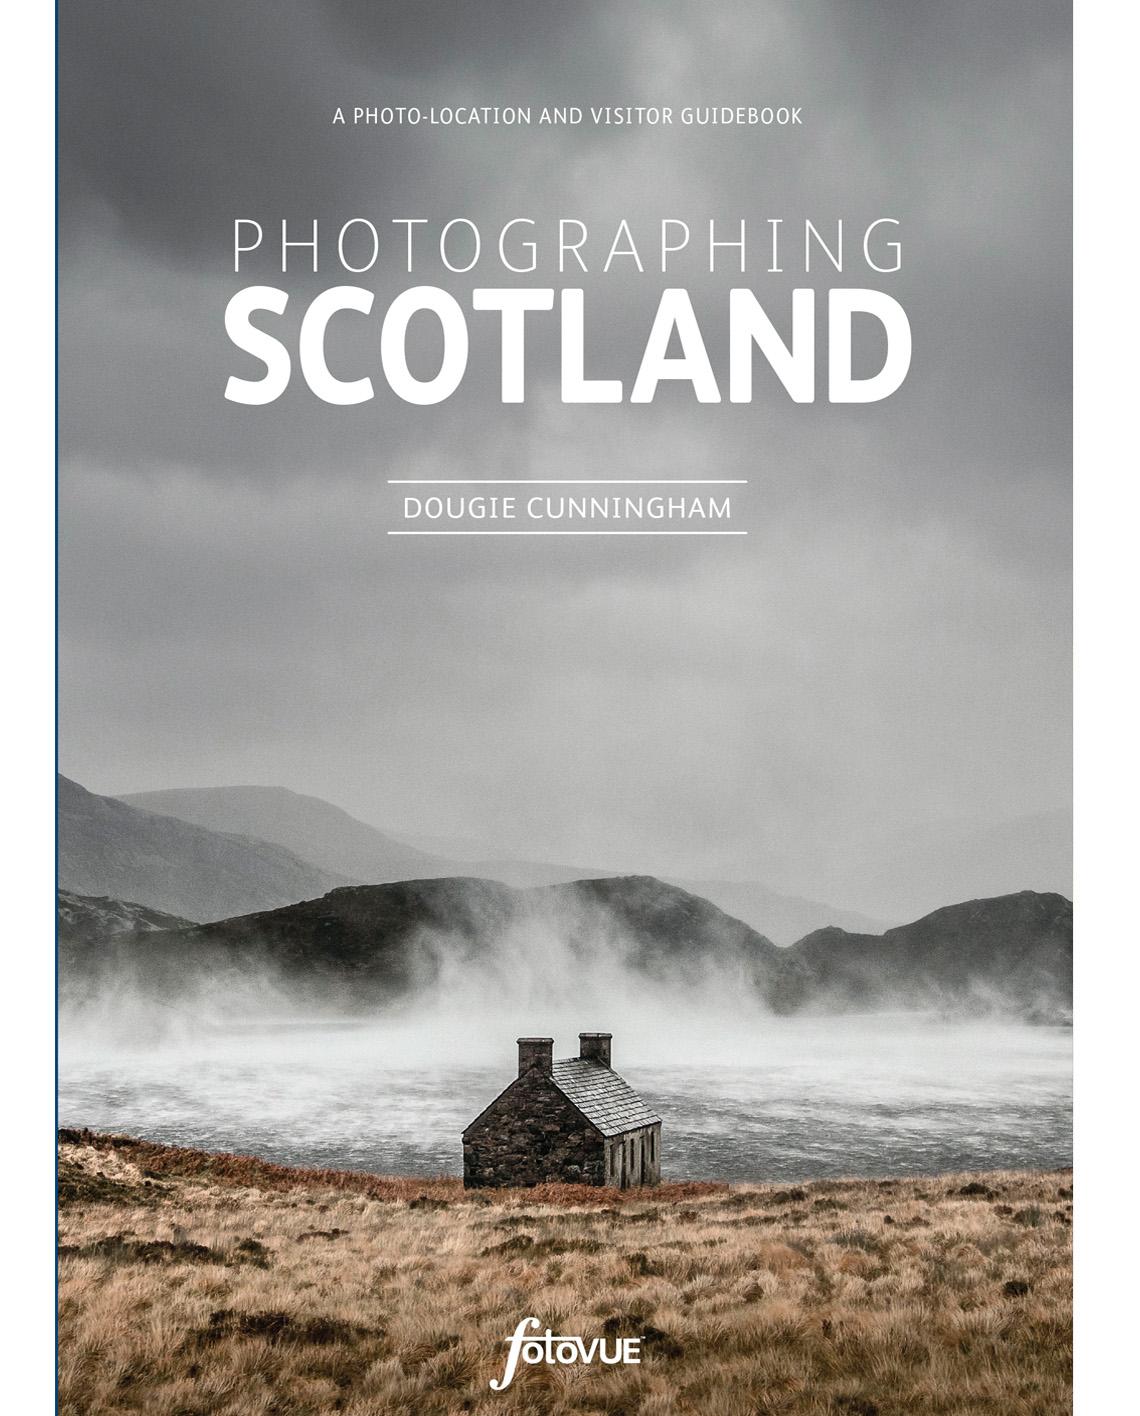 Scotland-cover-front-shop.jpg